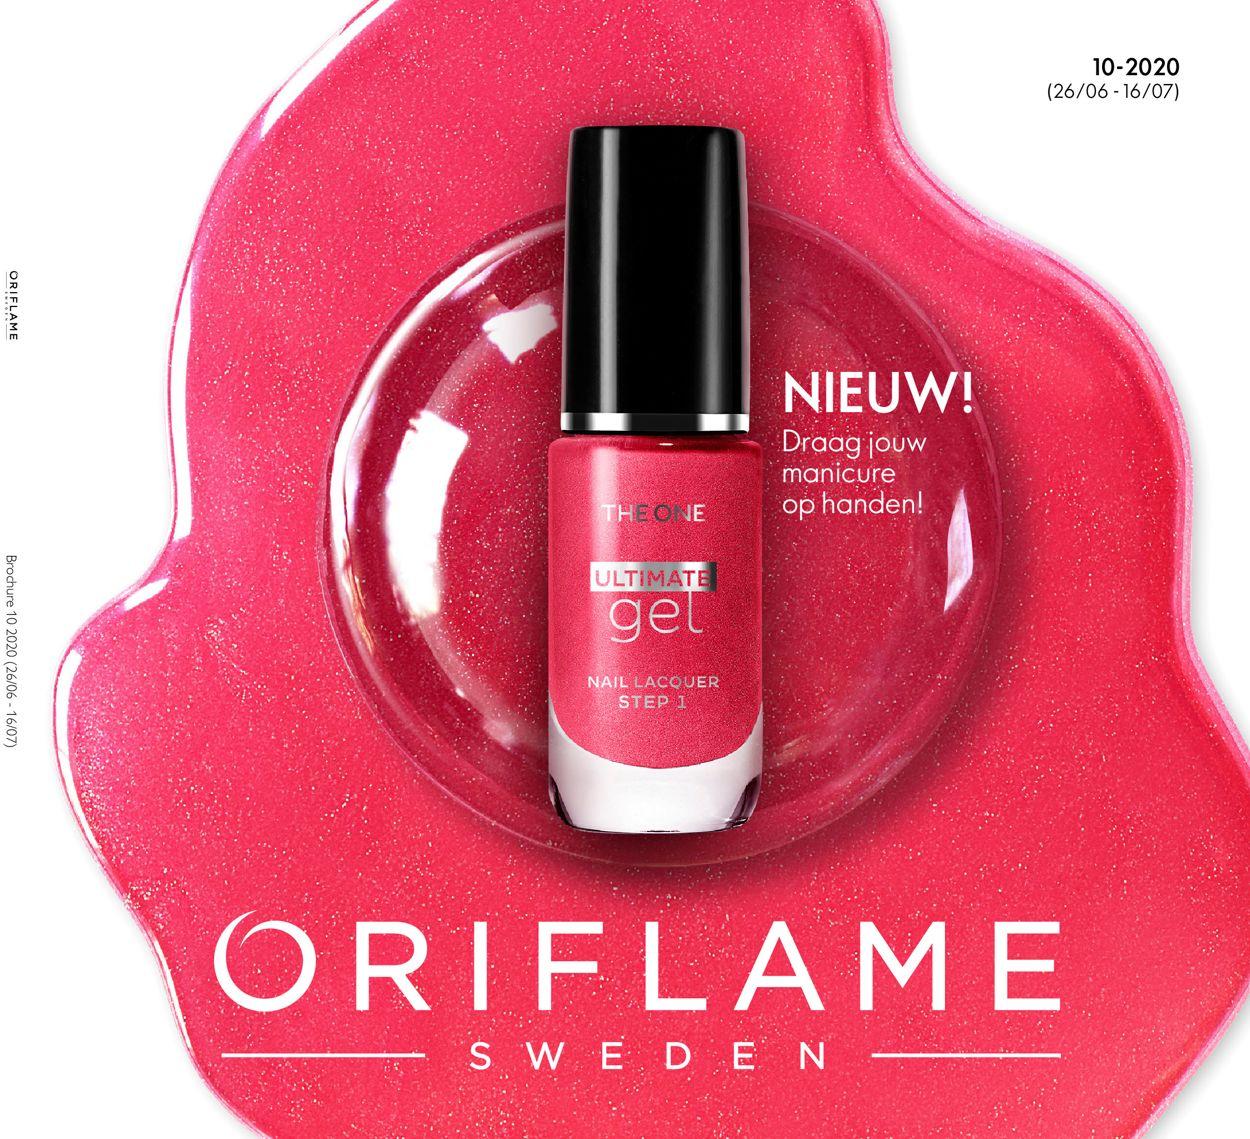 Oriflame Folder - 26.06-16.07.2020